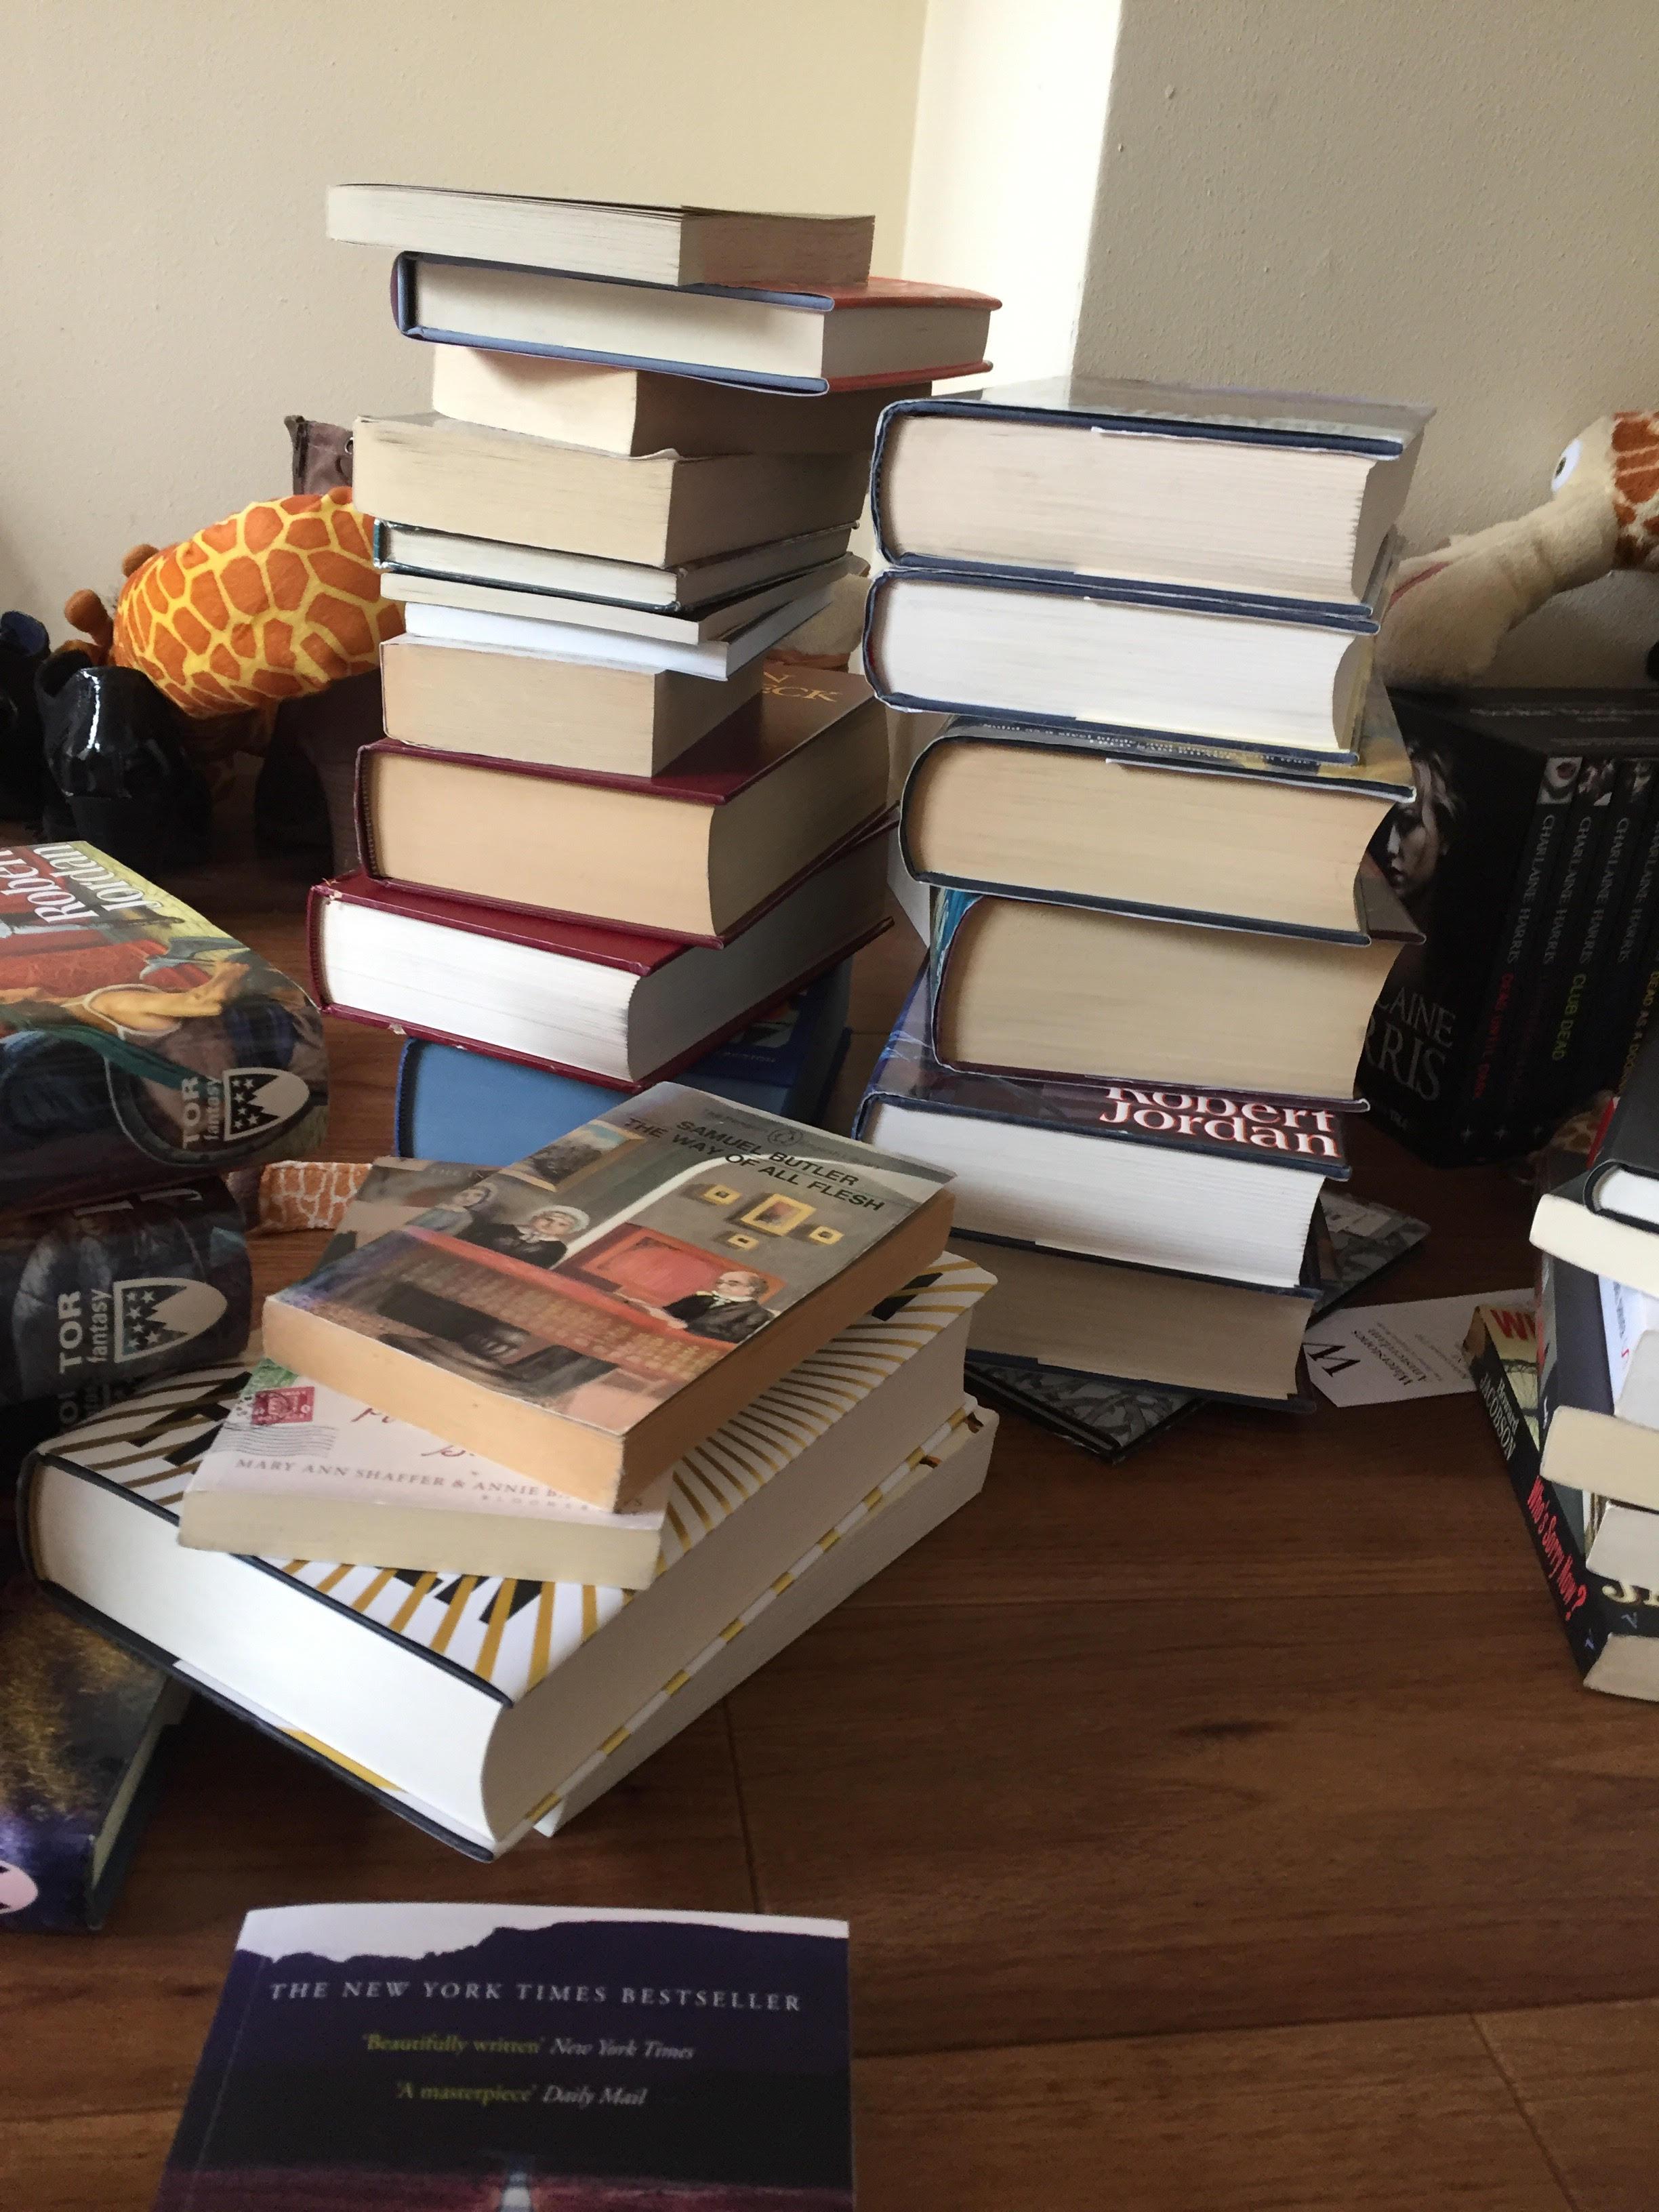 Just some random books